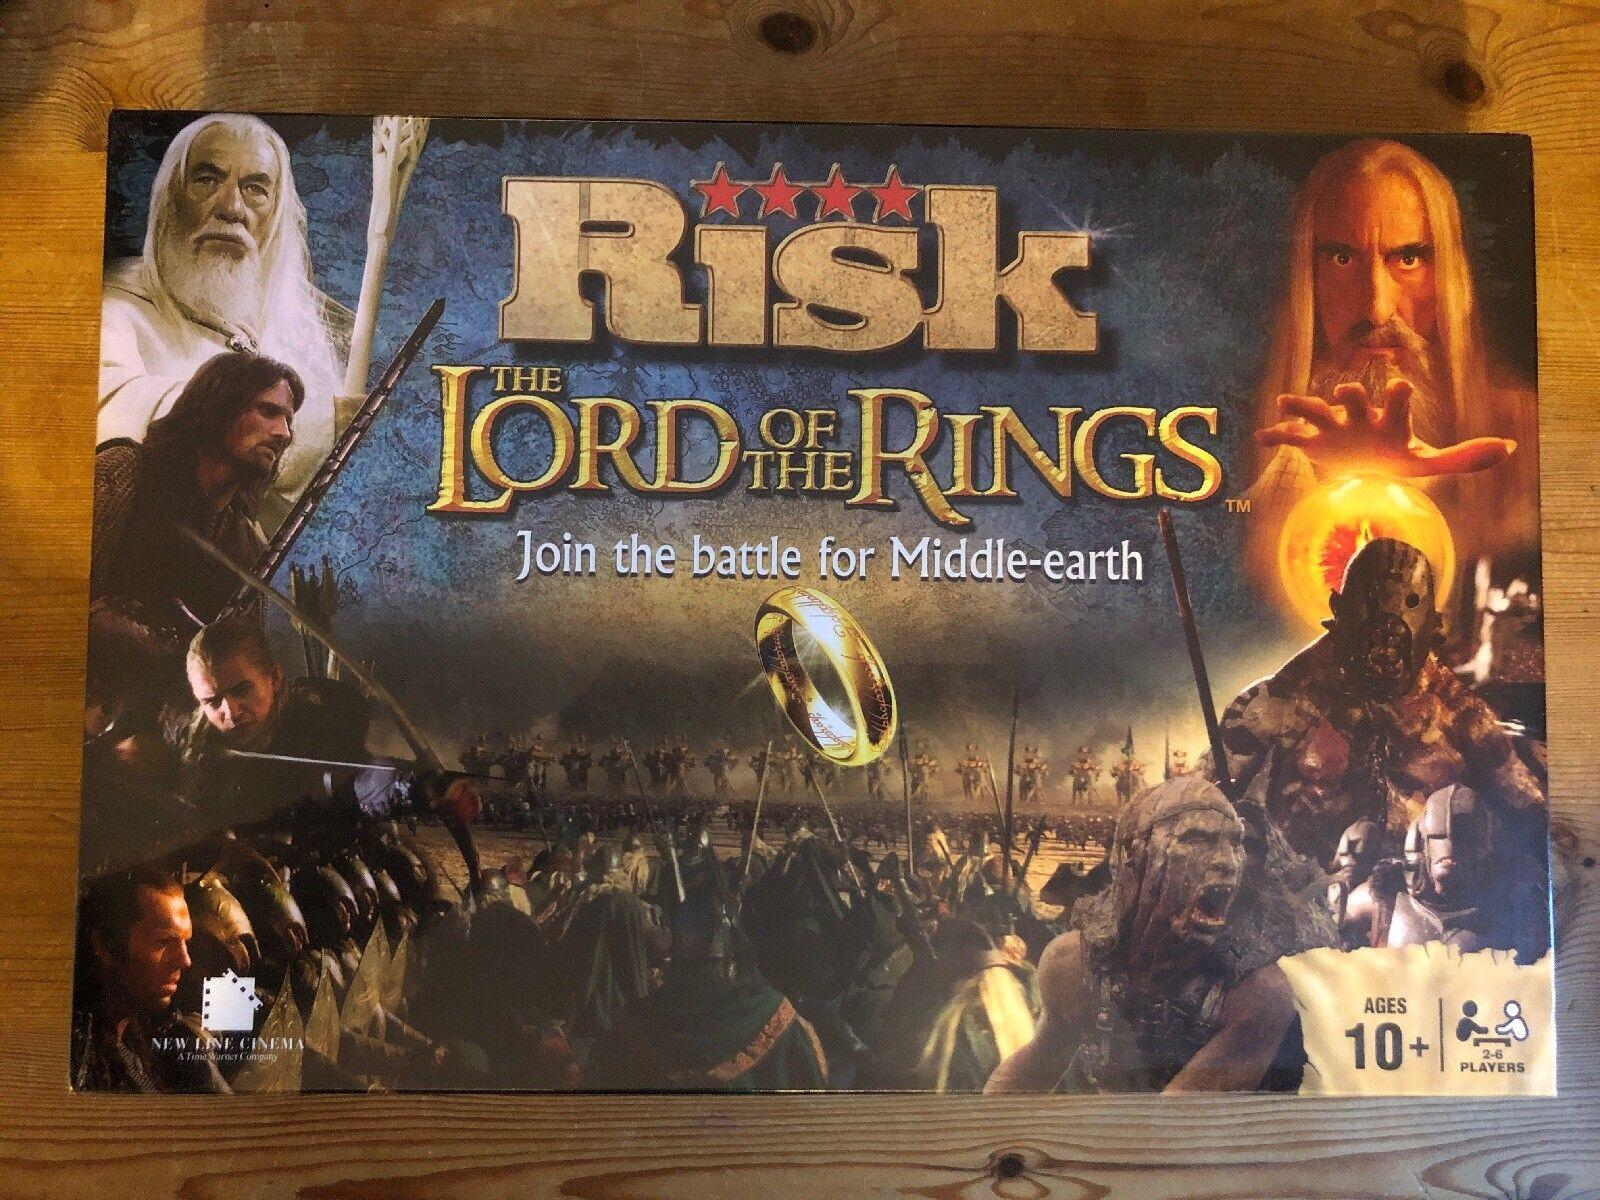 Le Seigneur des Anneaux Risk Board Game Battle For Middle Earth Board Game 10+ Hasbro